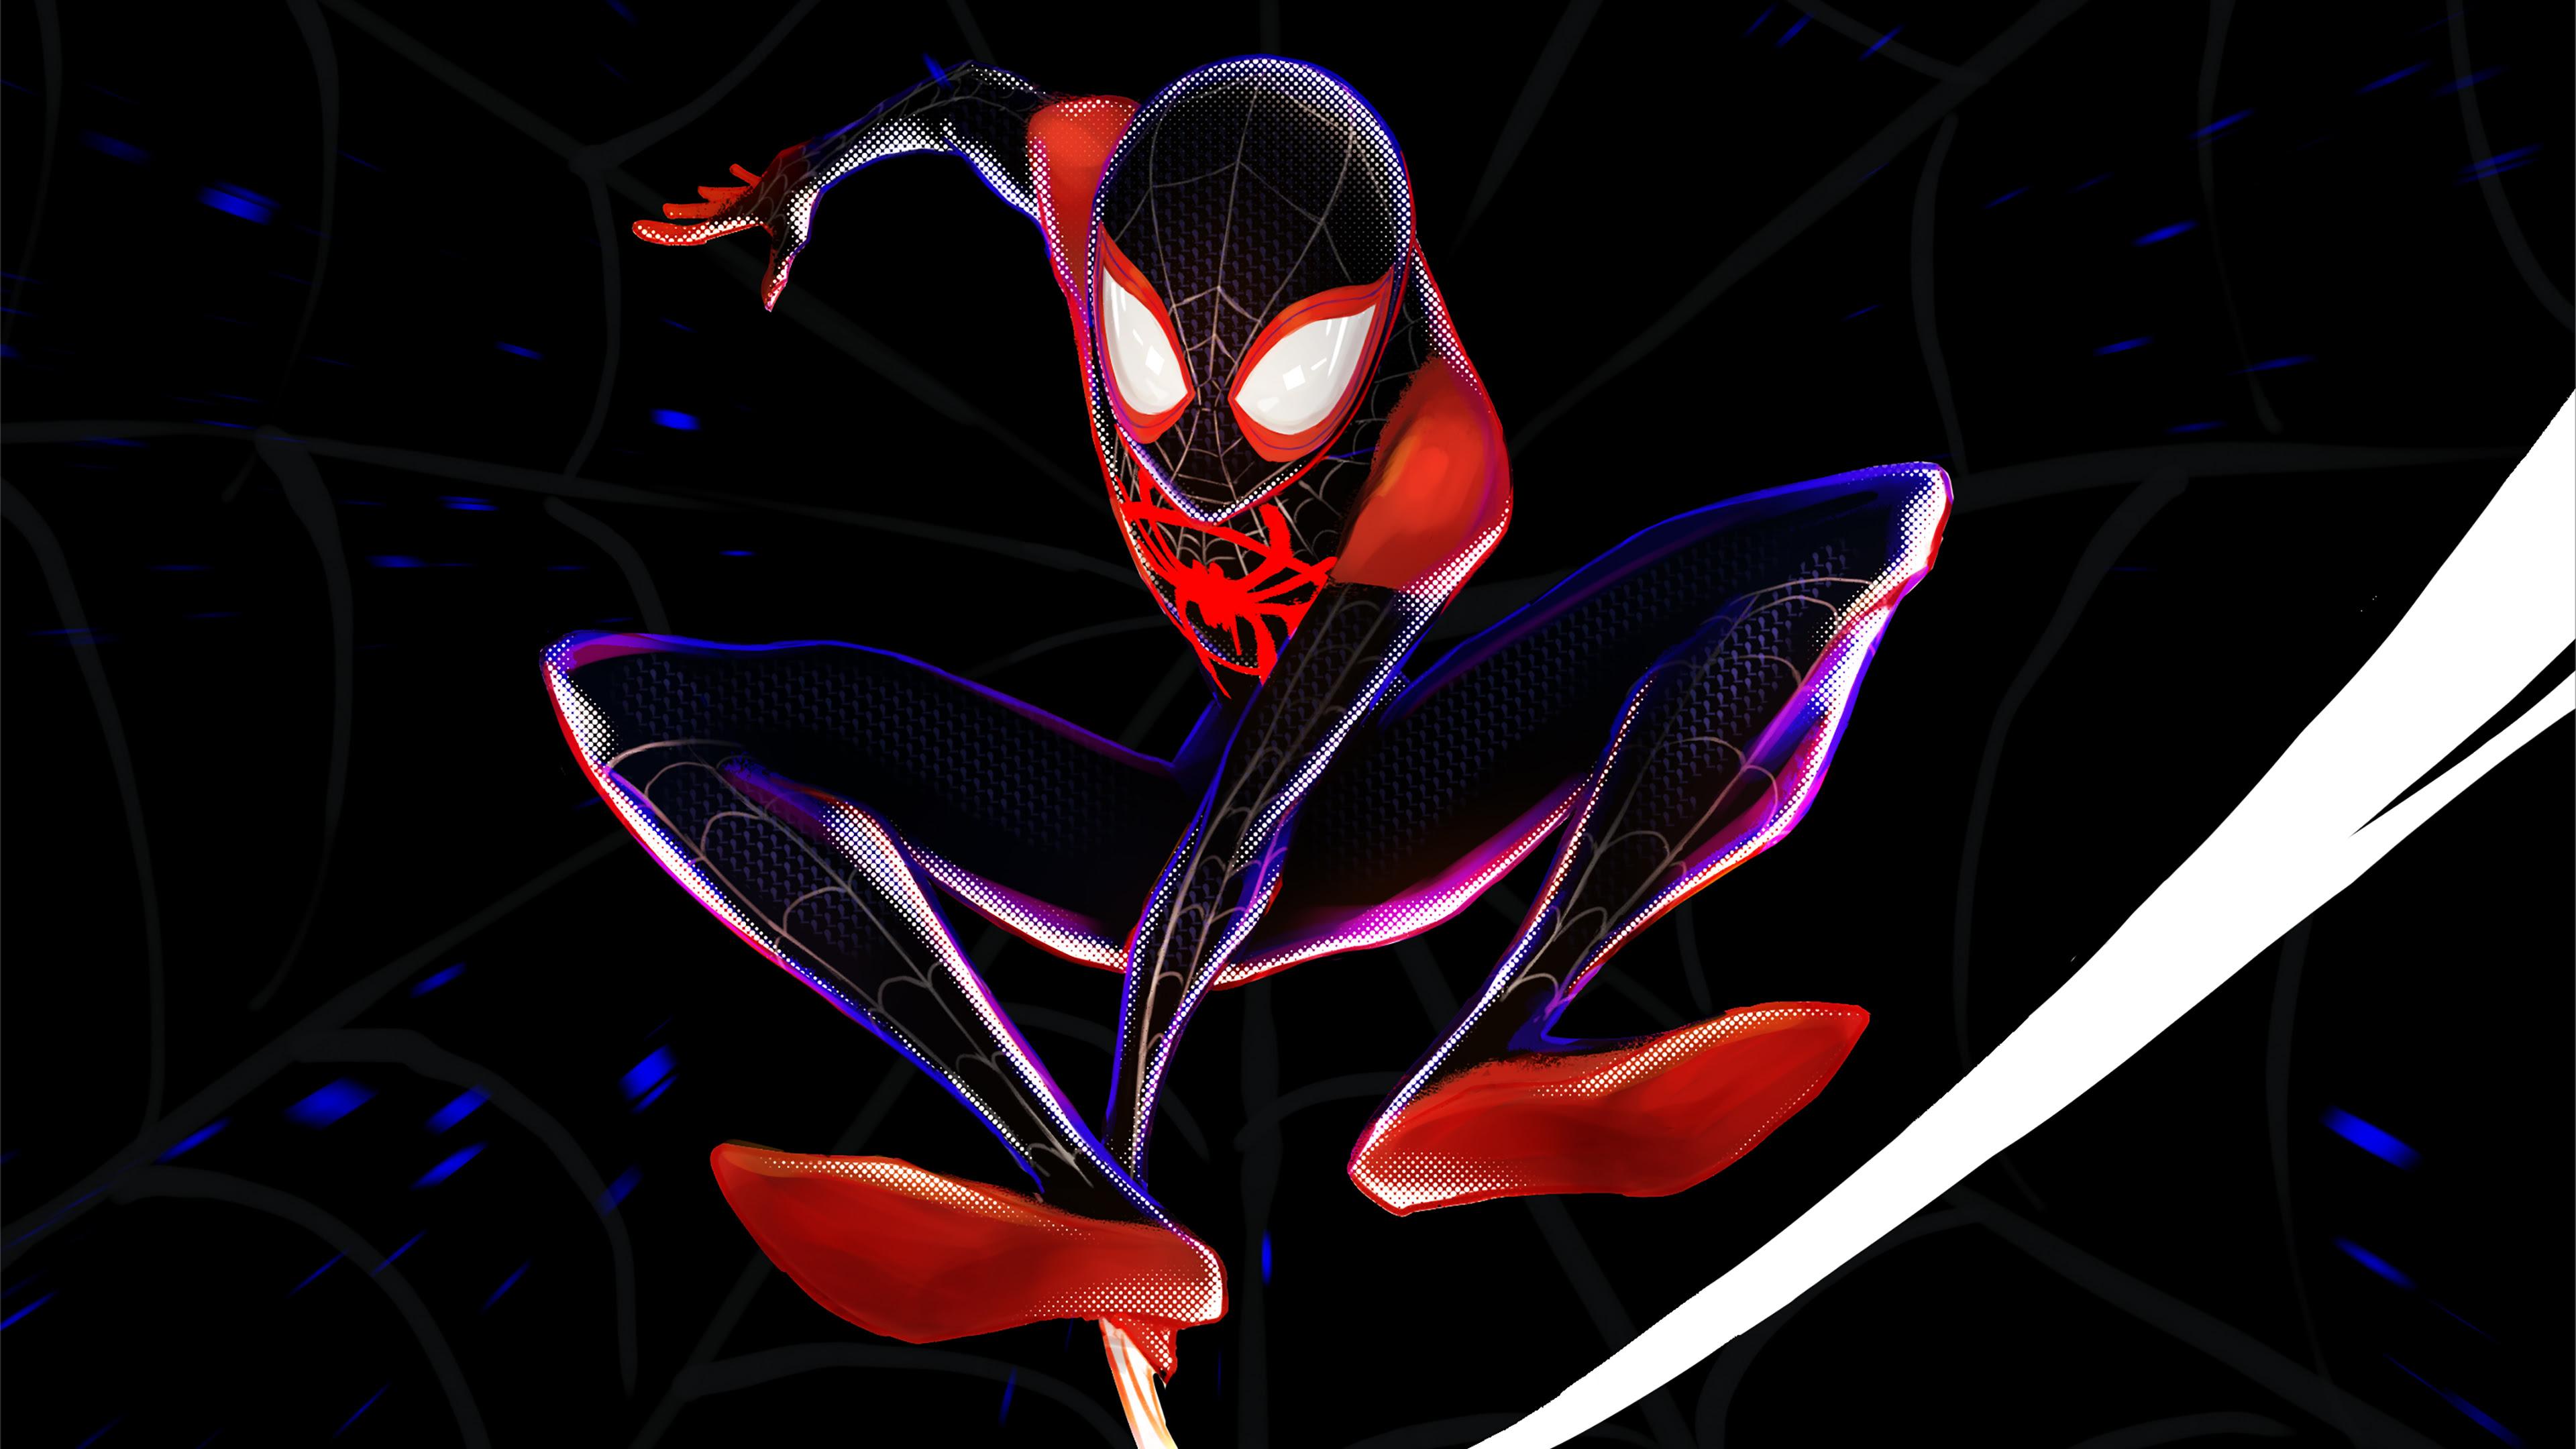 Miles Morales Spider Man 4k Wallpapers Wallpapers Hd